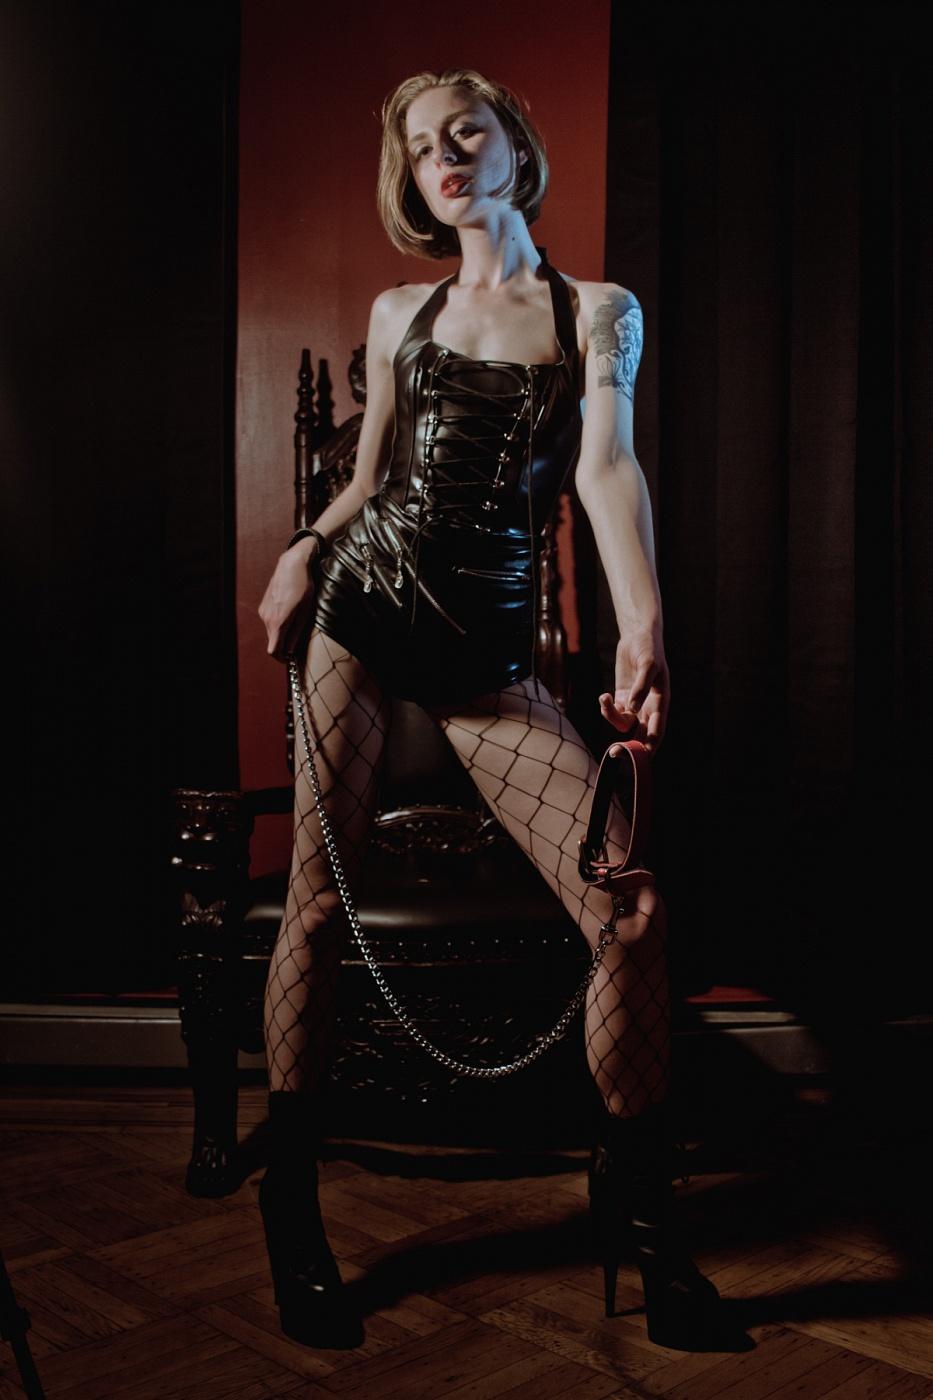 Sybil Fury